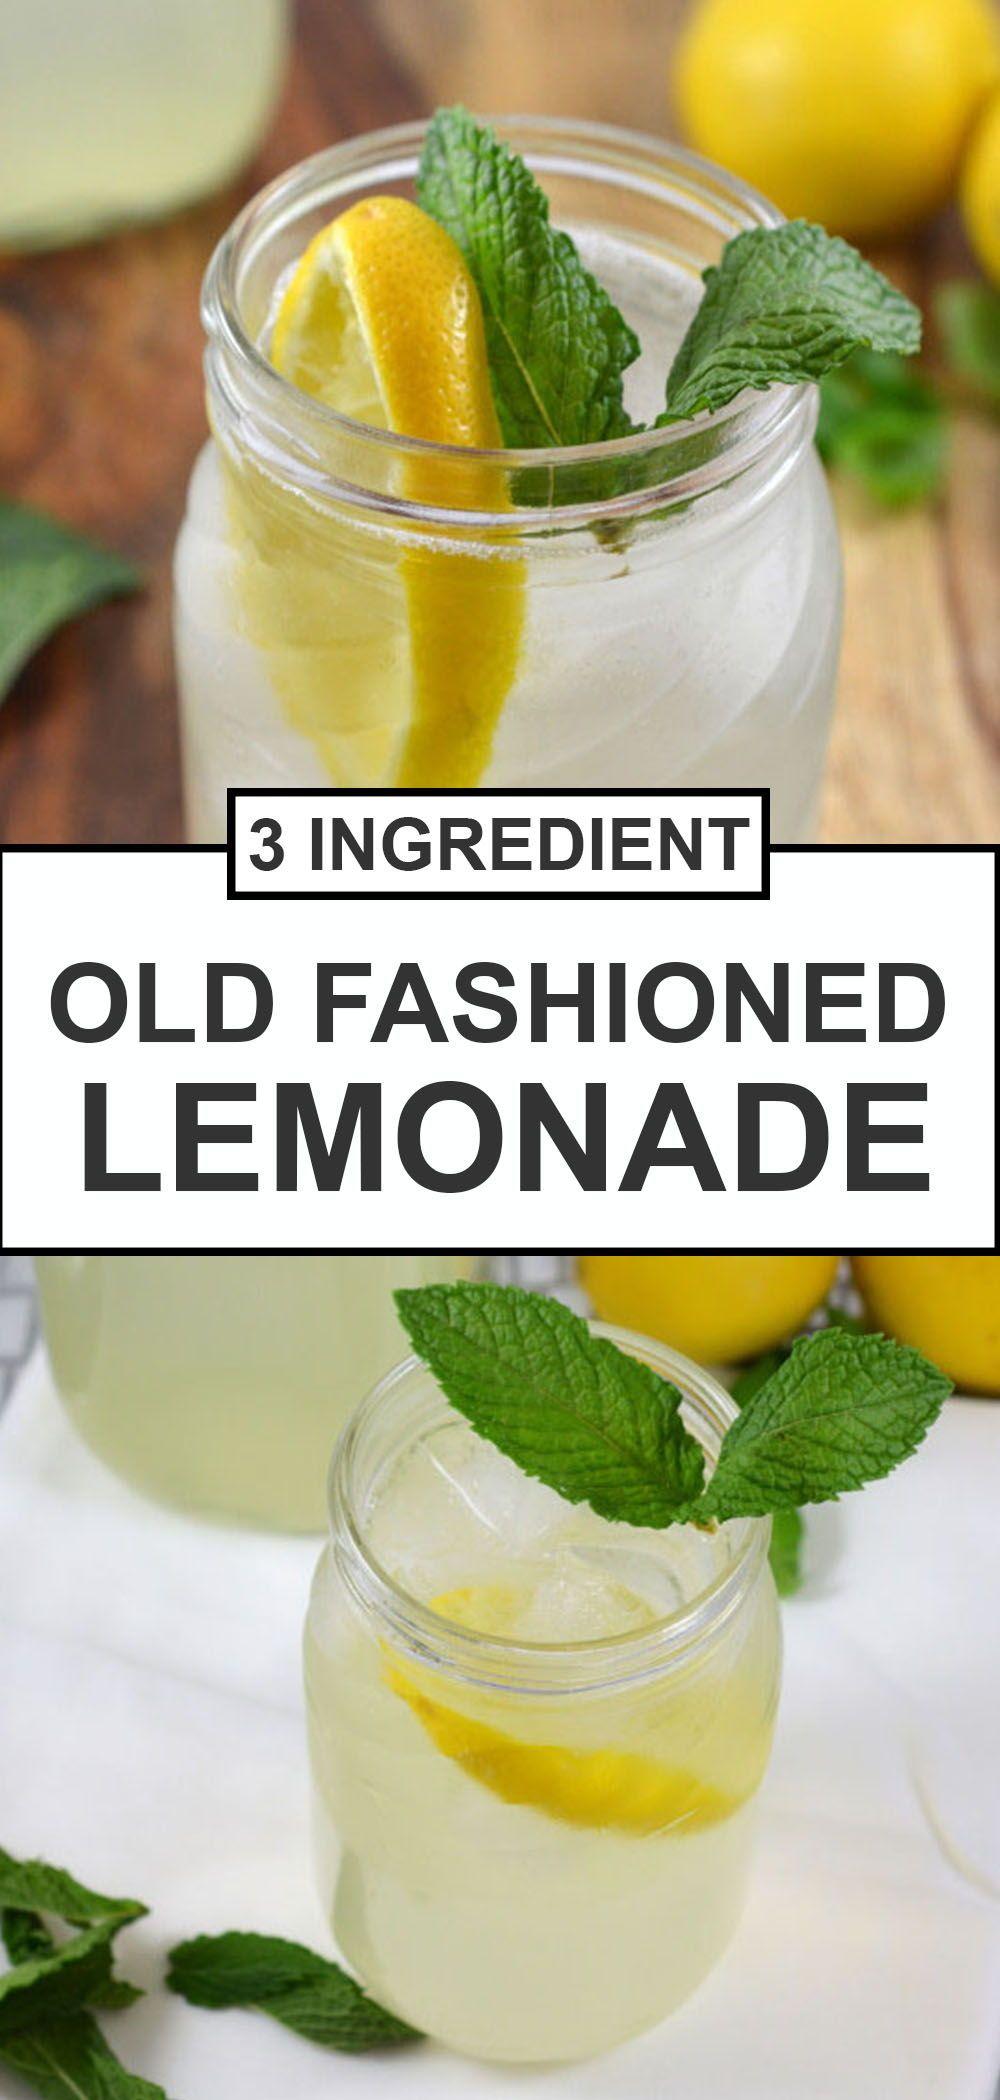 Easy Lemonade Recipe (3 Ingredients!) - Chef Savvy